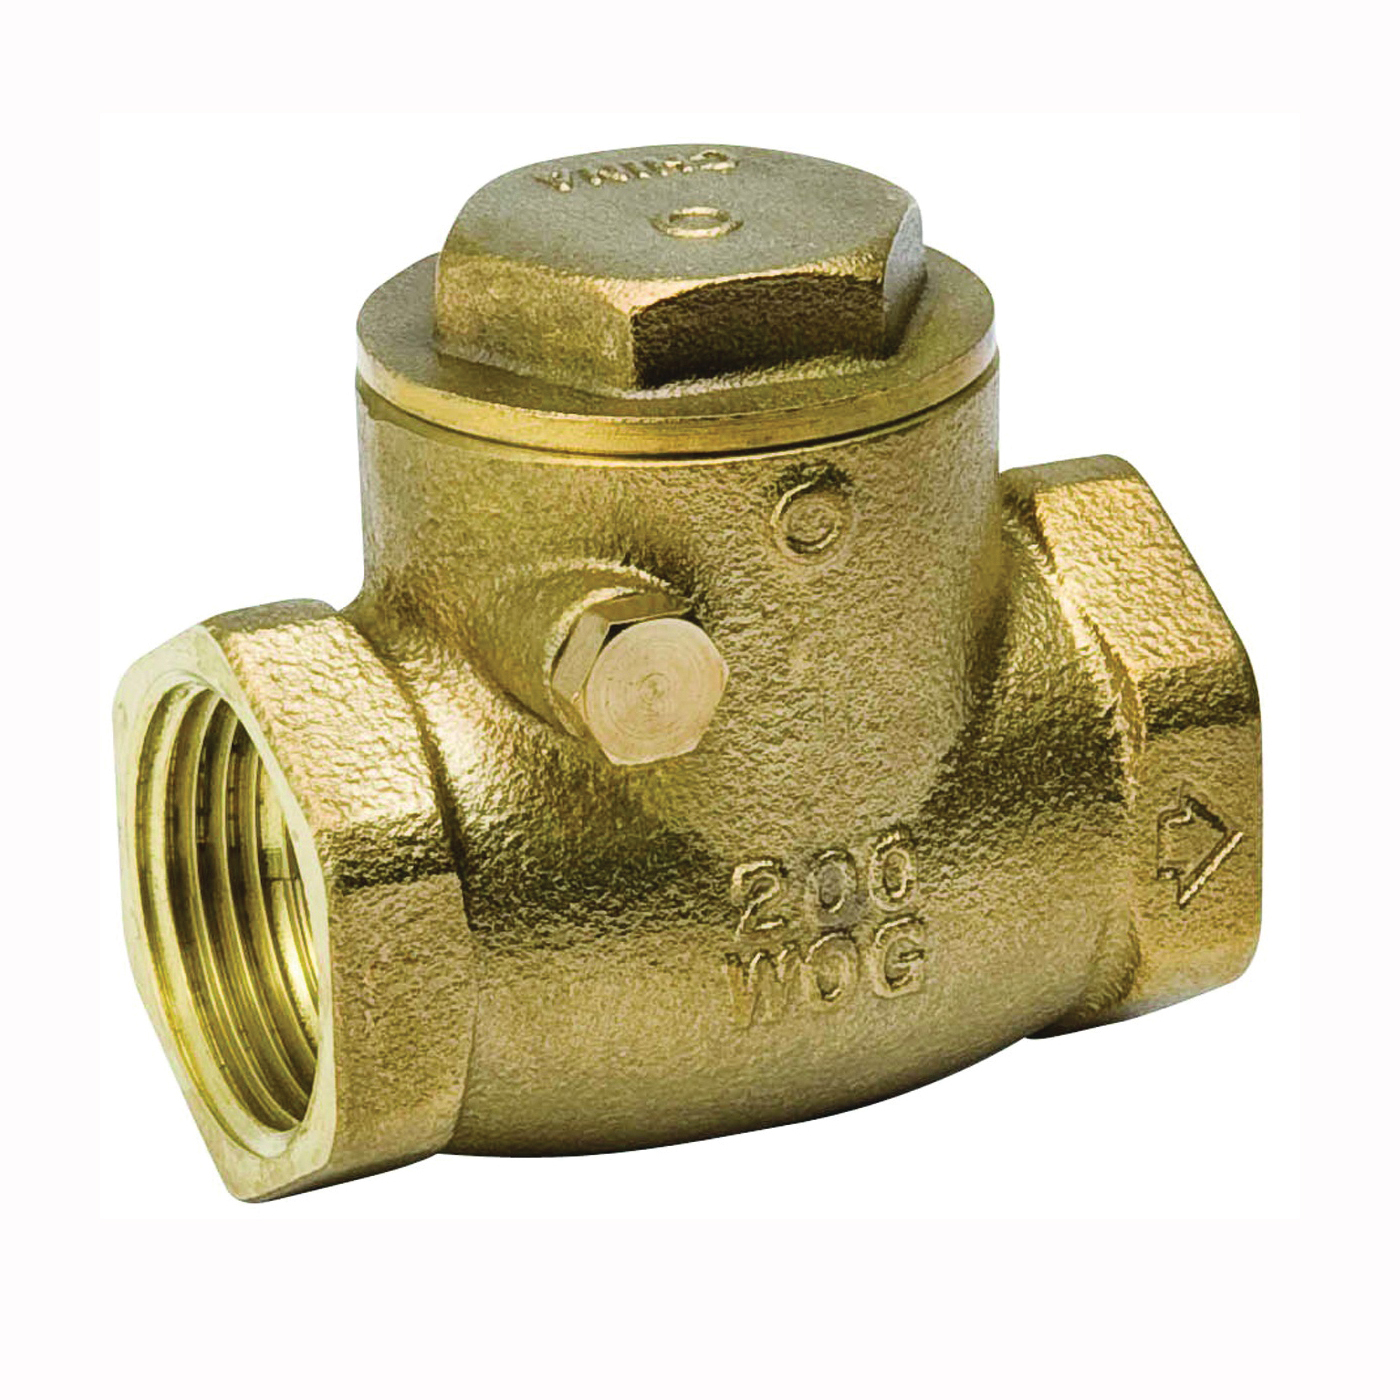 Picture of B & K ProLine 101-005NL Check Valve, 1 in, IPS, 200 psi Pressure, Brass Body